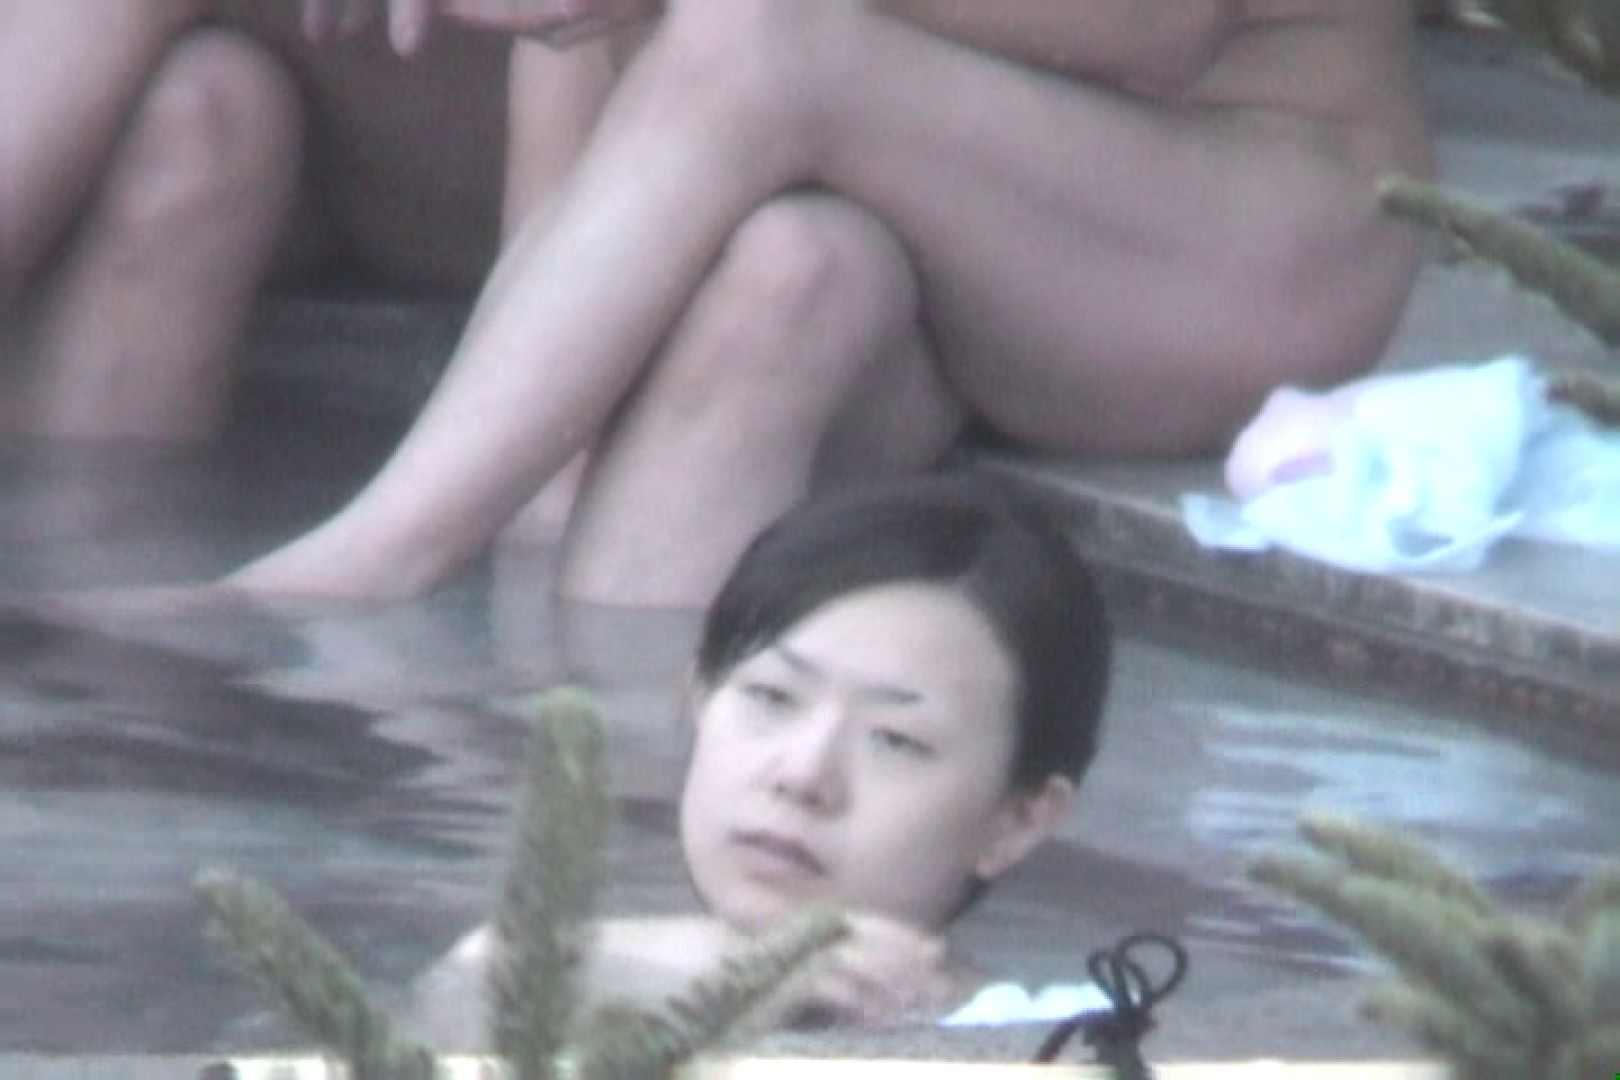 Aquaな露天風呂Vol.609 盗撮シリーズ   露天風呂編  107PIX 23